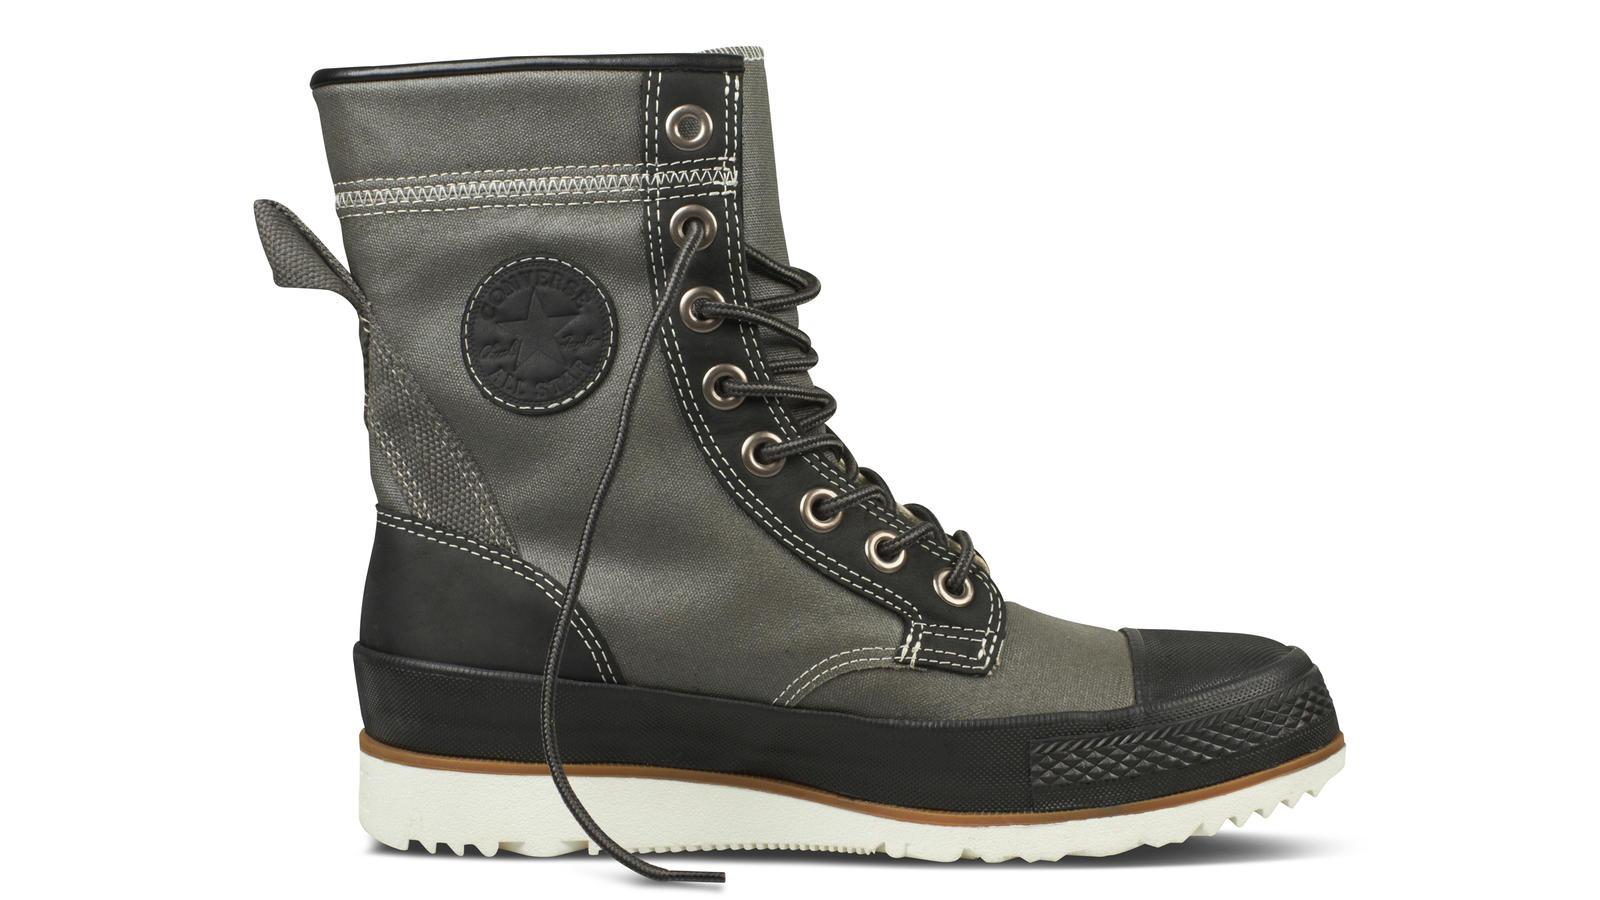 18c261903e25be Converse Announces Fall 2012 Chuck Taylor All Star Footwear ...